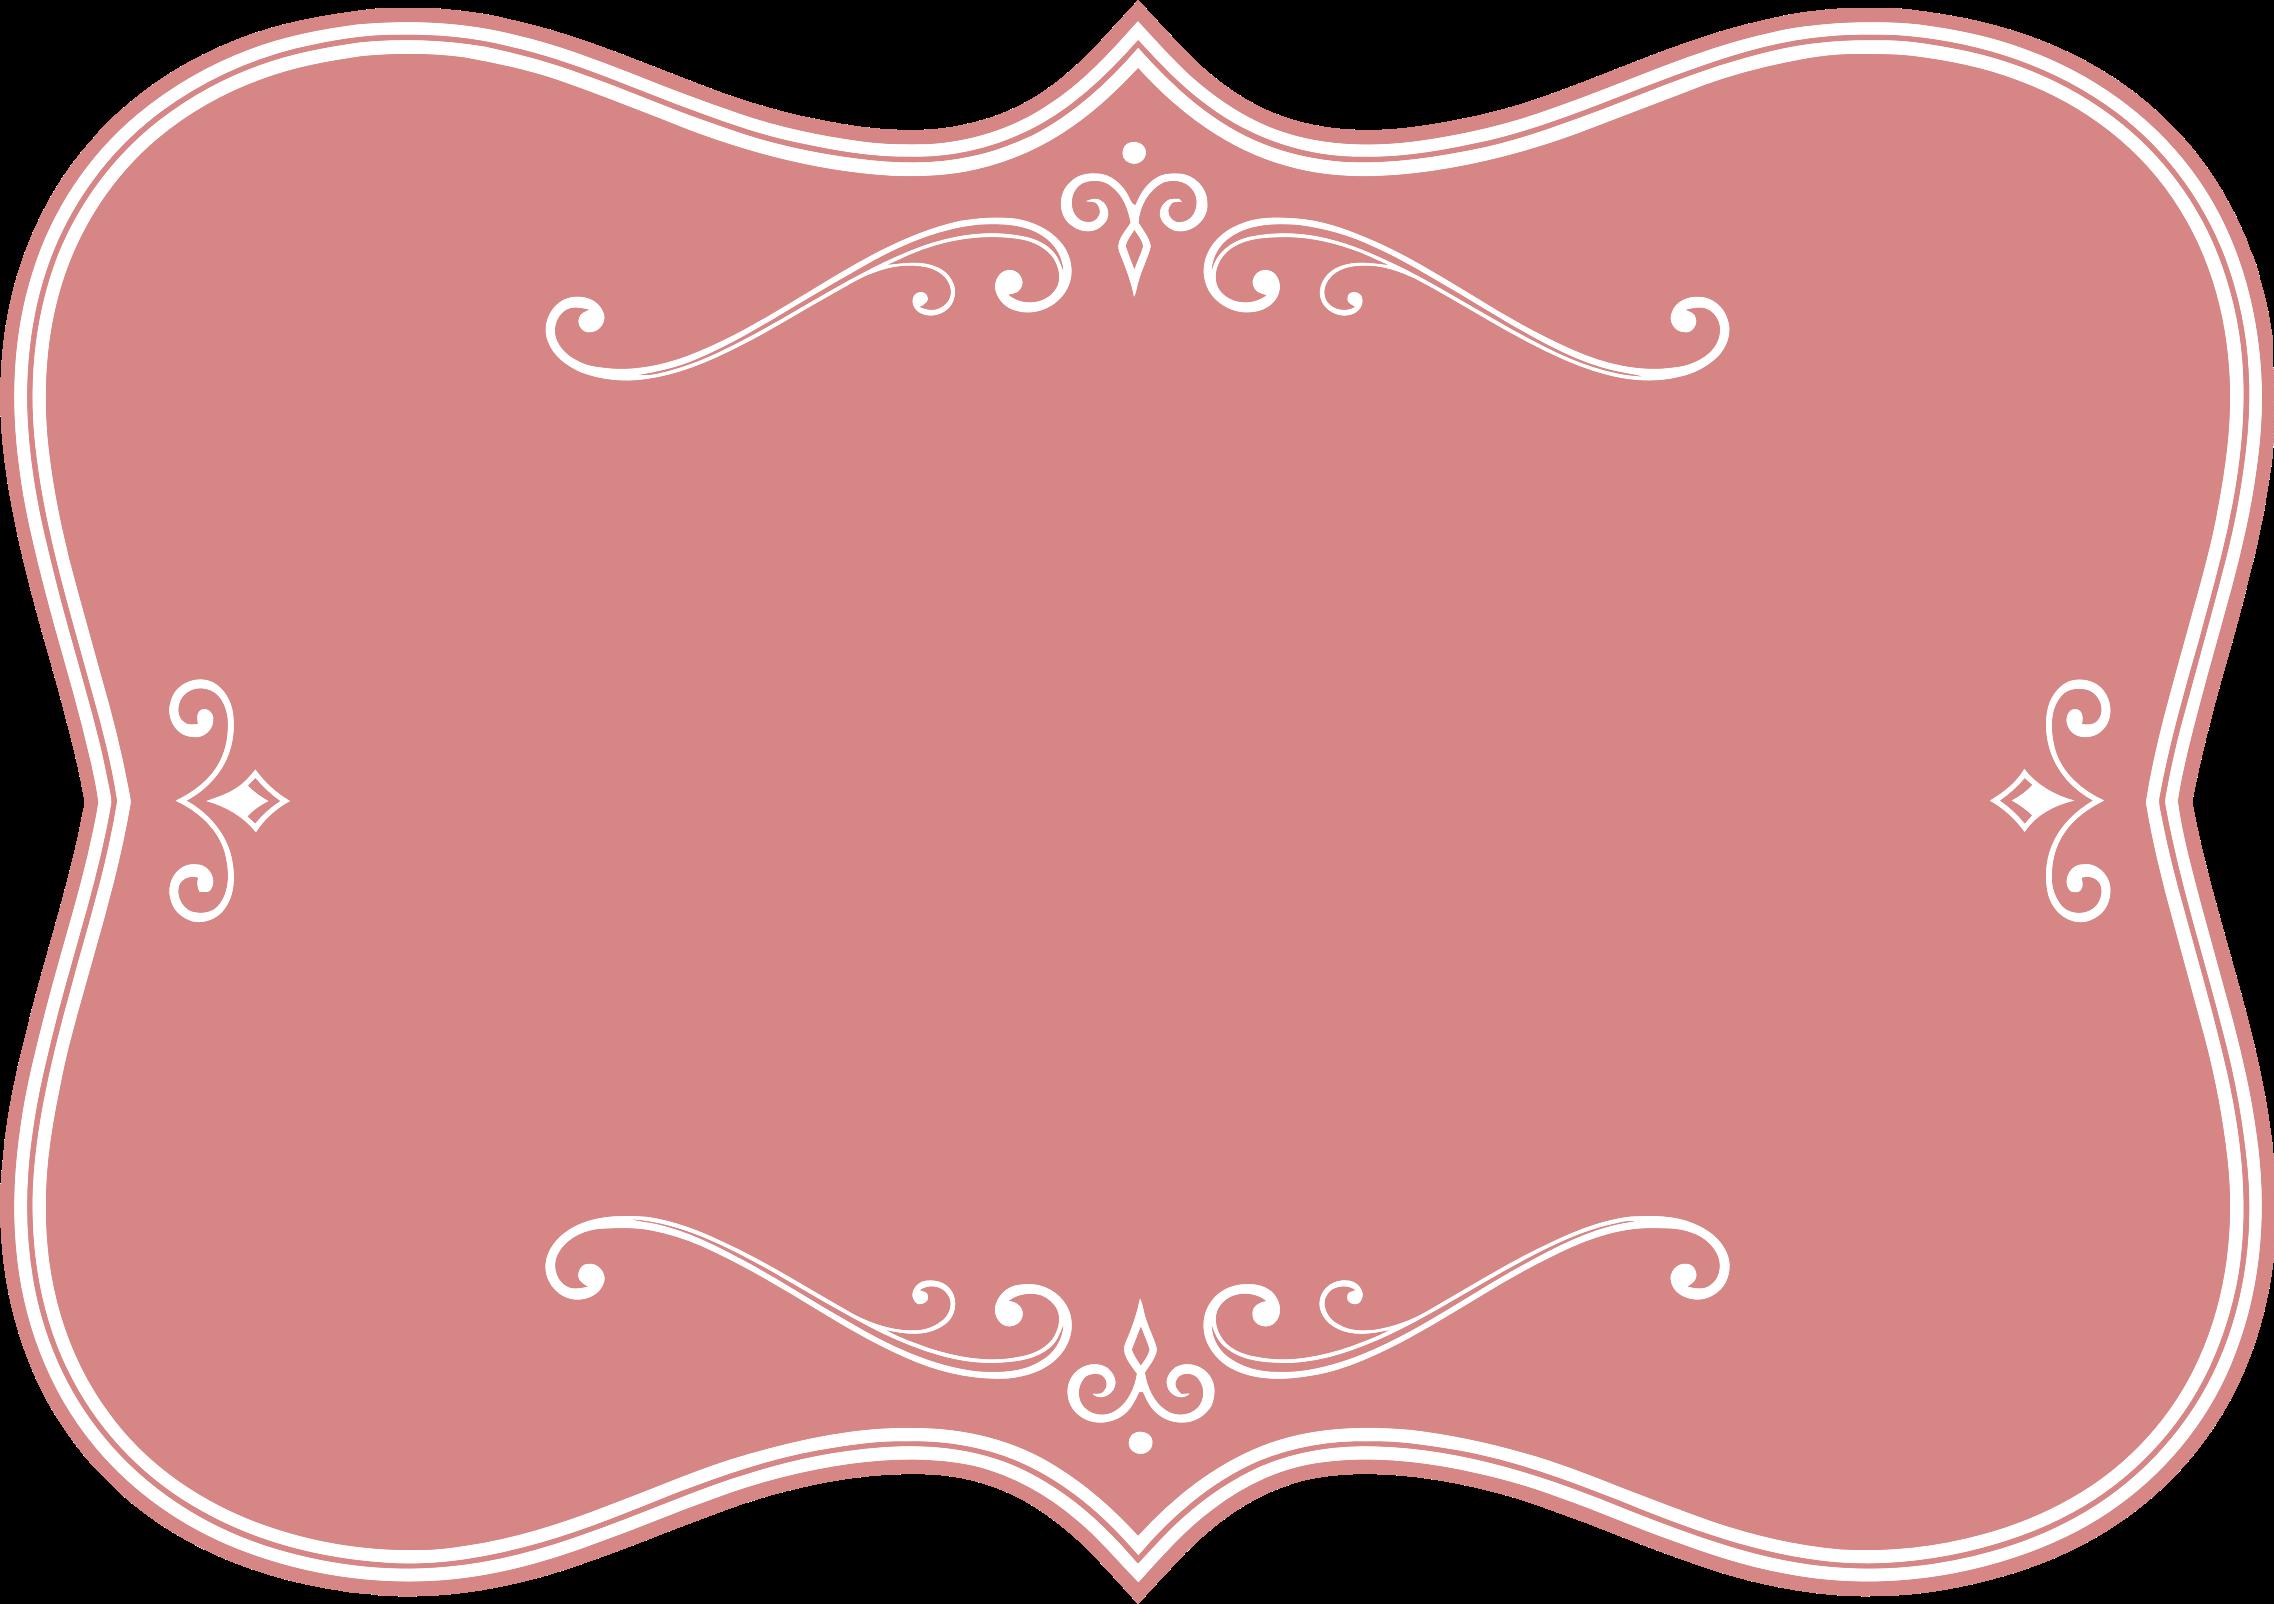 Maroon clipart frame Pink Flourish Flourish Decorative Pink